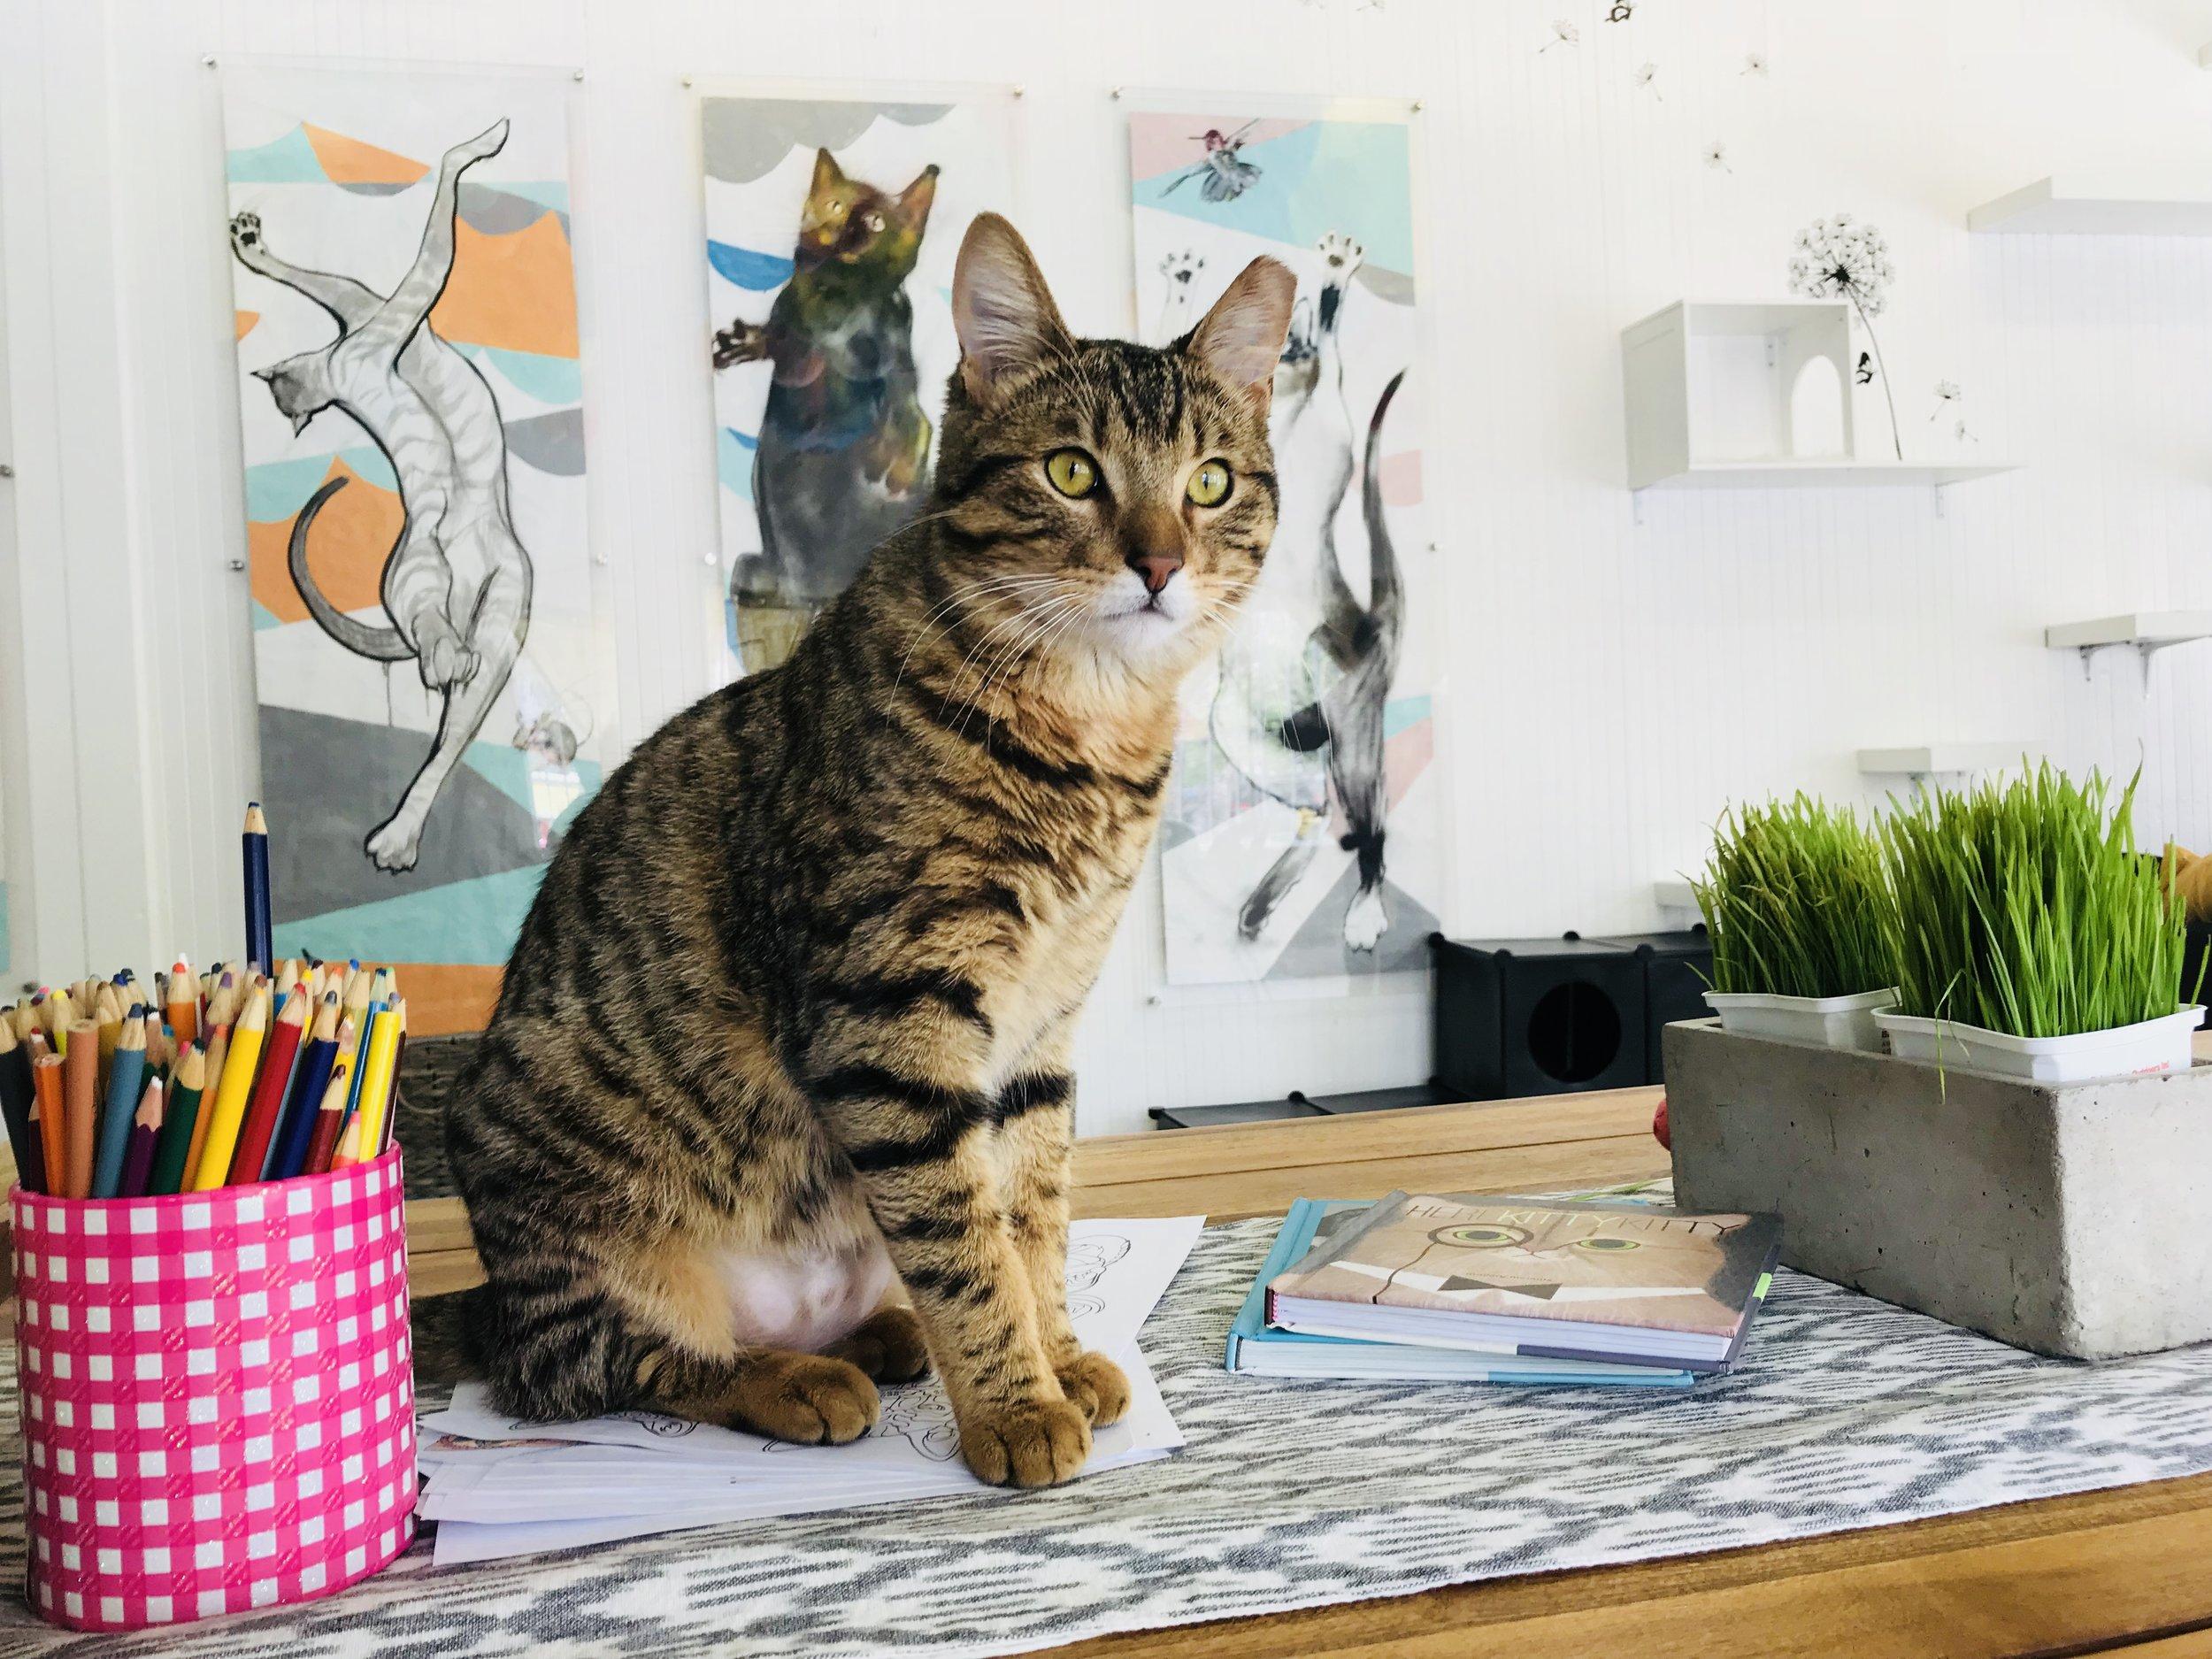 Magnificent Mowgli